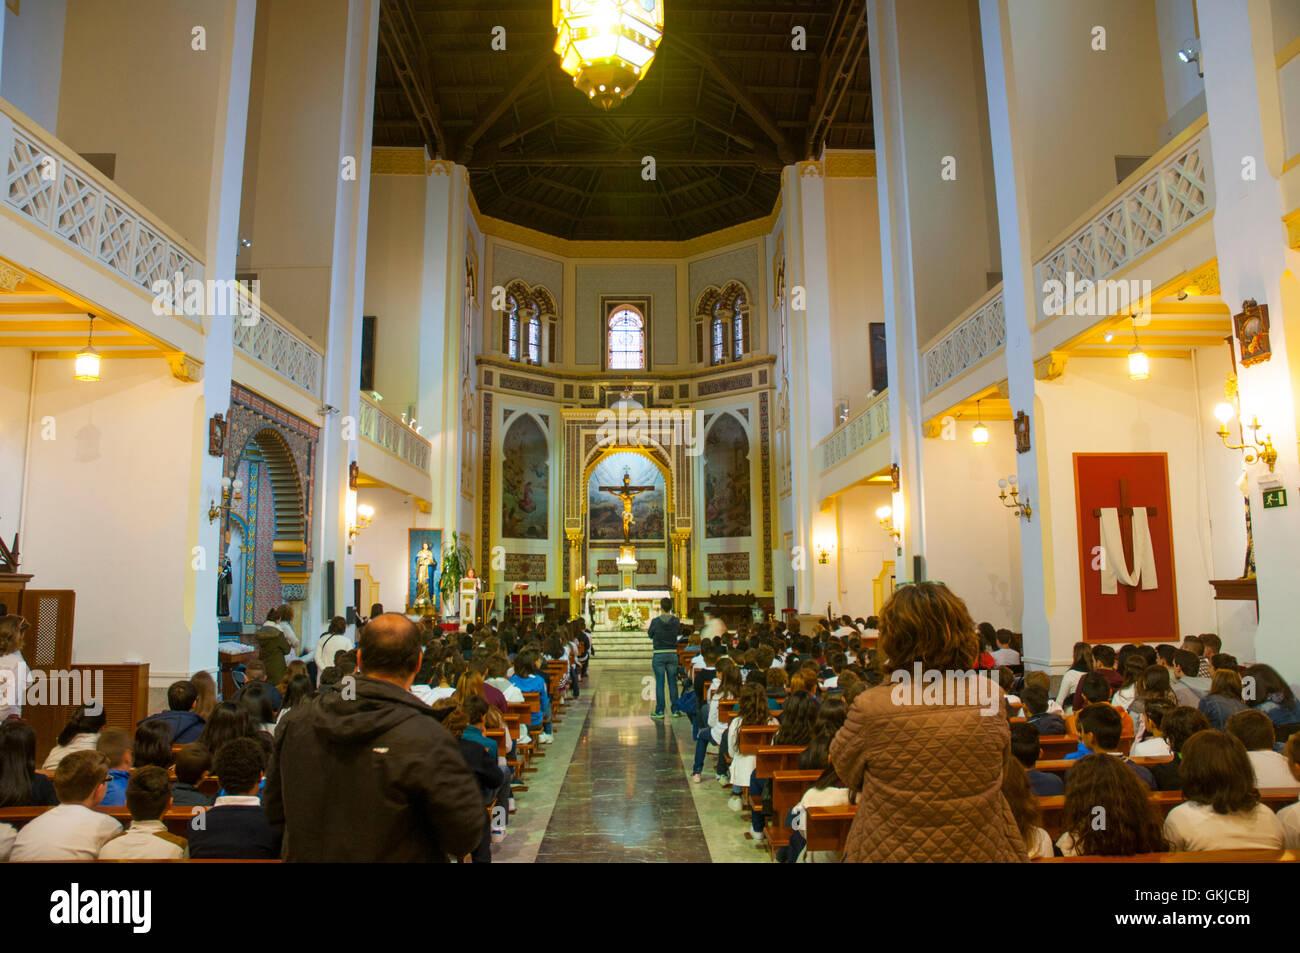 Personas Que Celebraban La Misa Iglesia De Santa Cristina Madrid